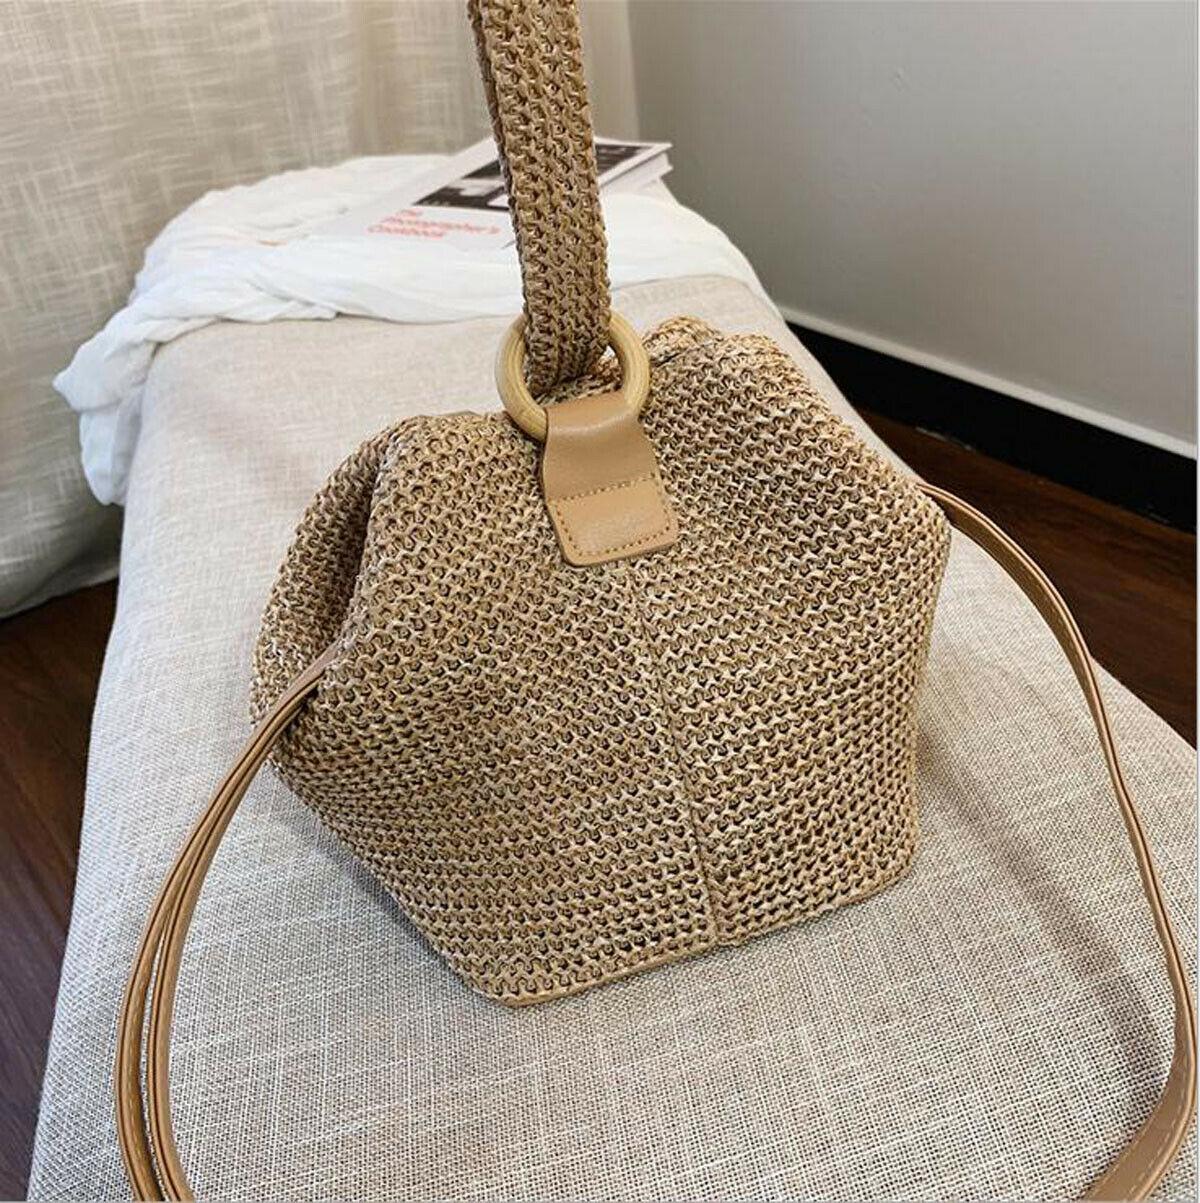 Women Boho Woven Handbag Tote Shoulder Bags New Fashion Summer Beach Casual Straw Wicker Messenger Handbag